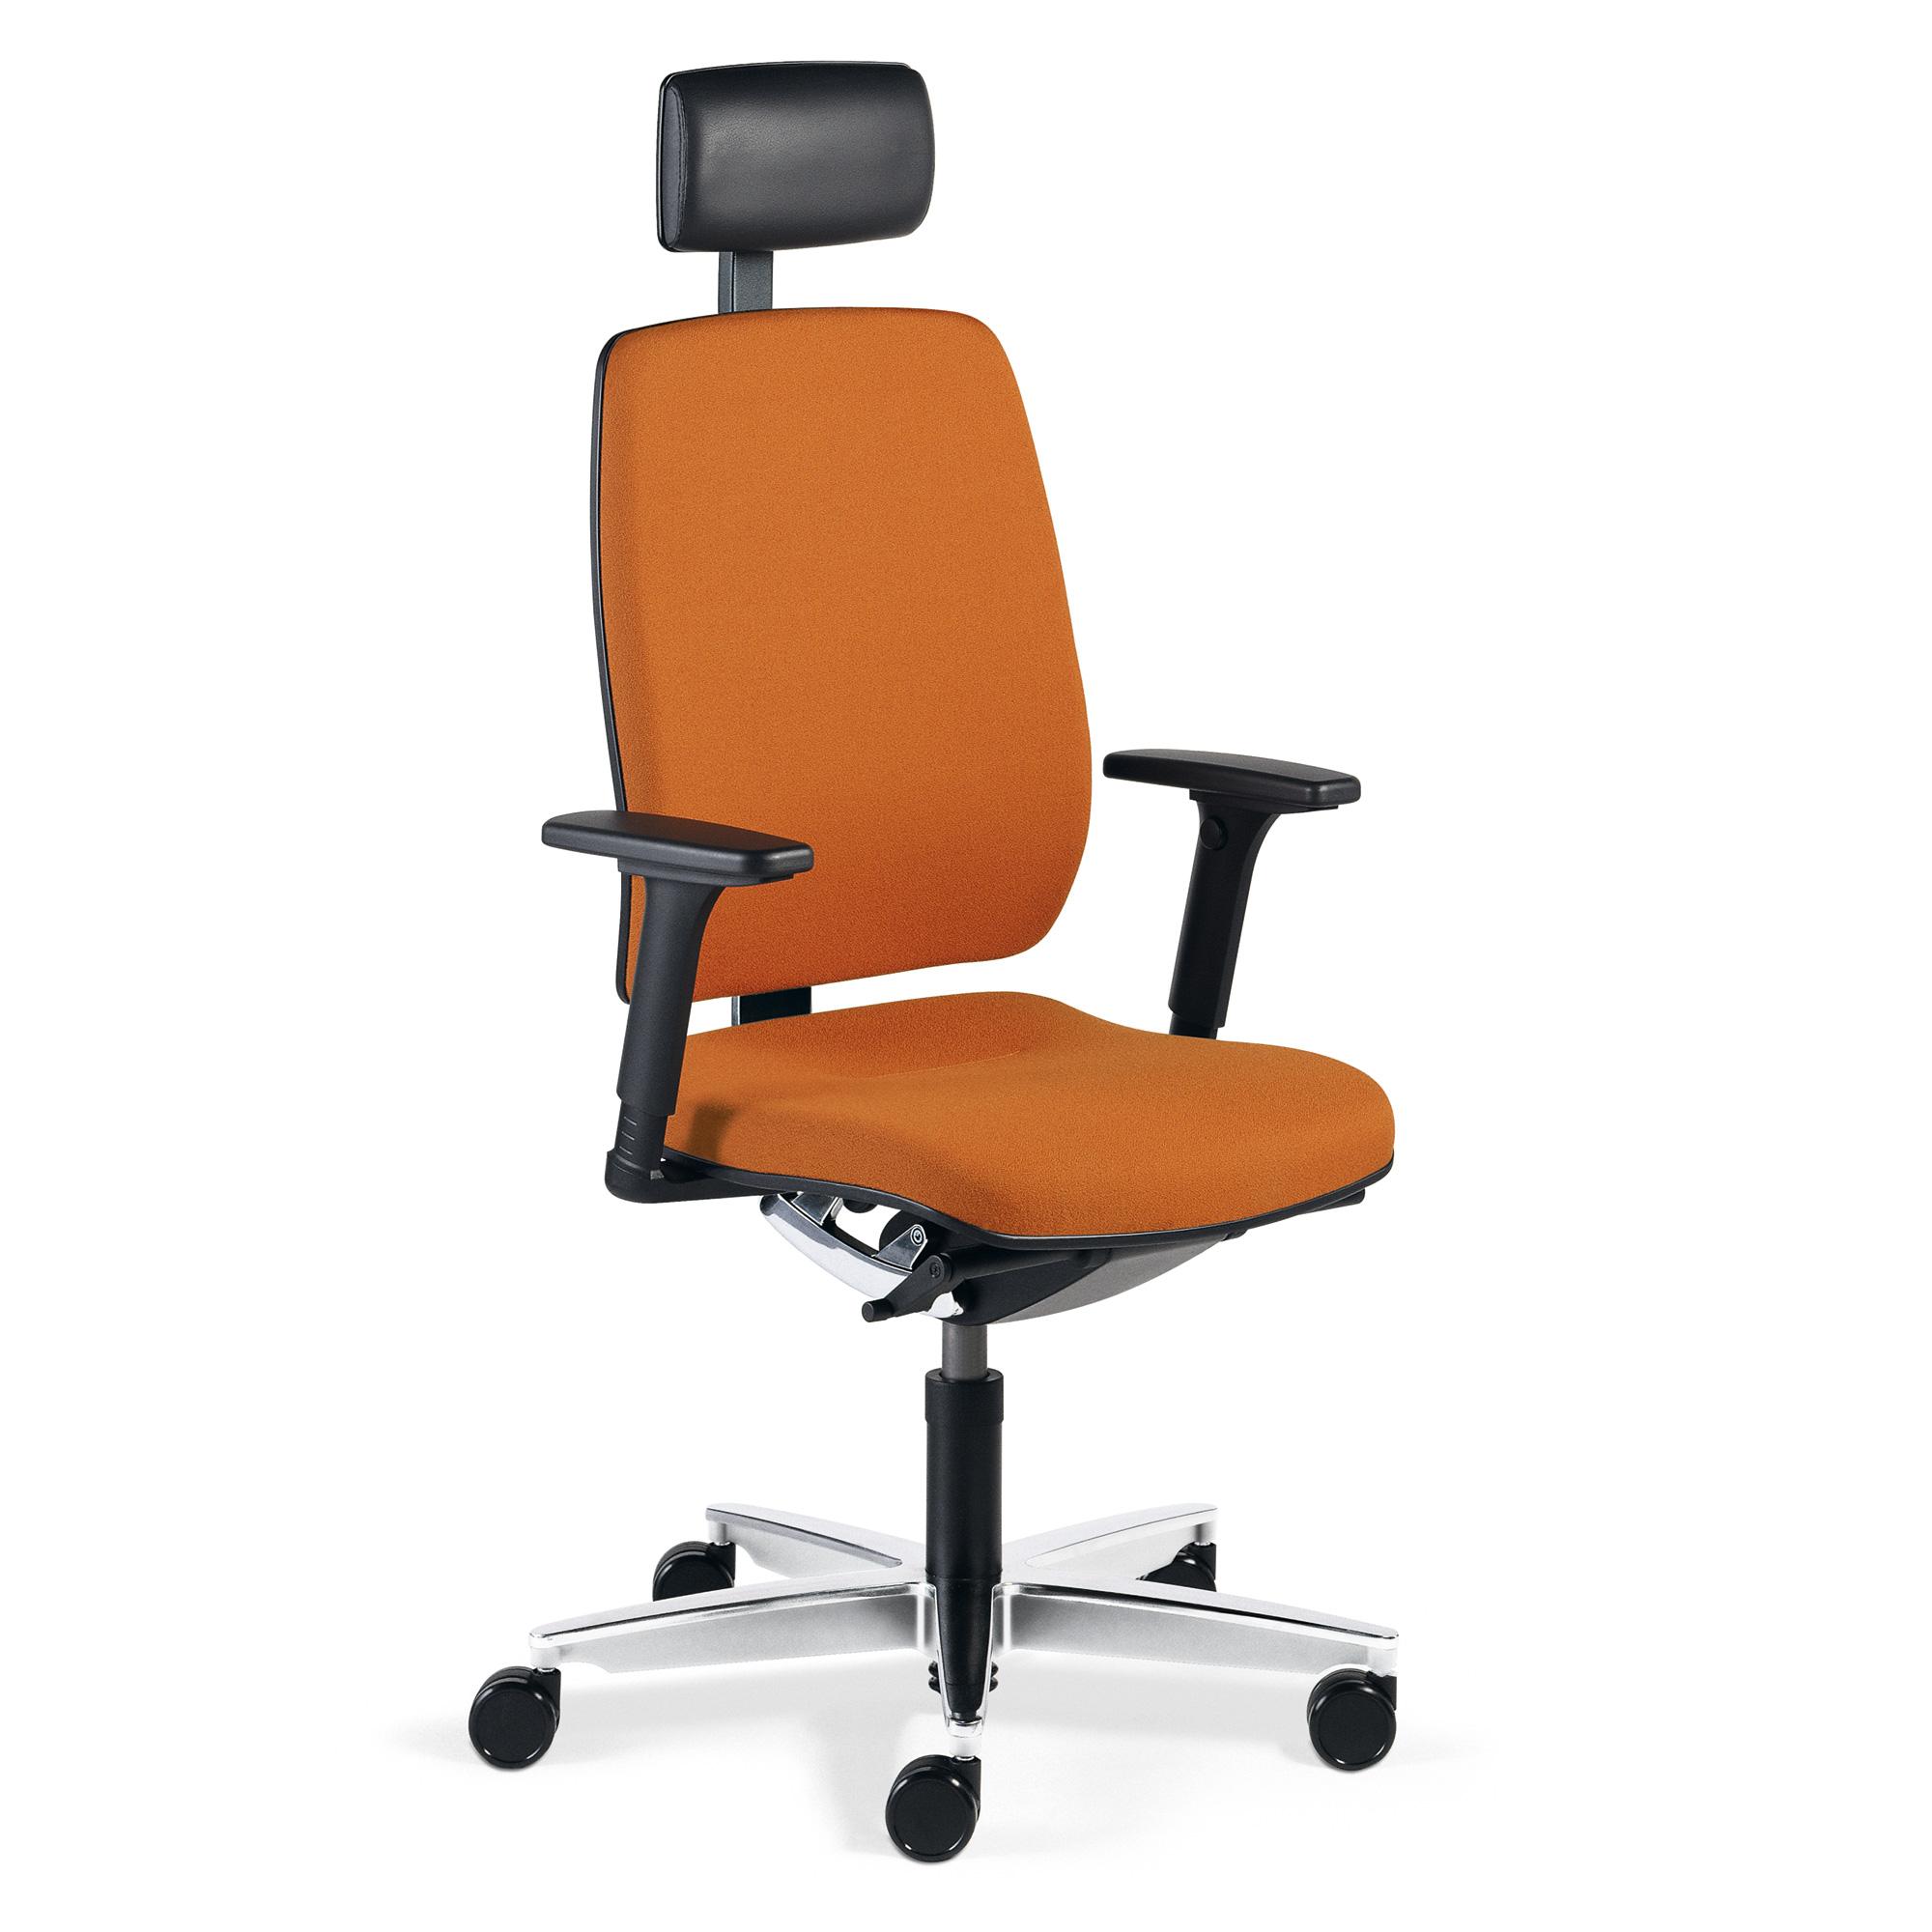 Sedus EARLY BIRD Bürodrehstuhl EB-102, hohe Rückenlehne und optionale Kopfstütze mit Lederbezug